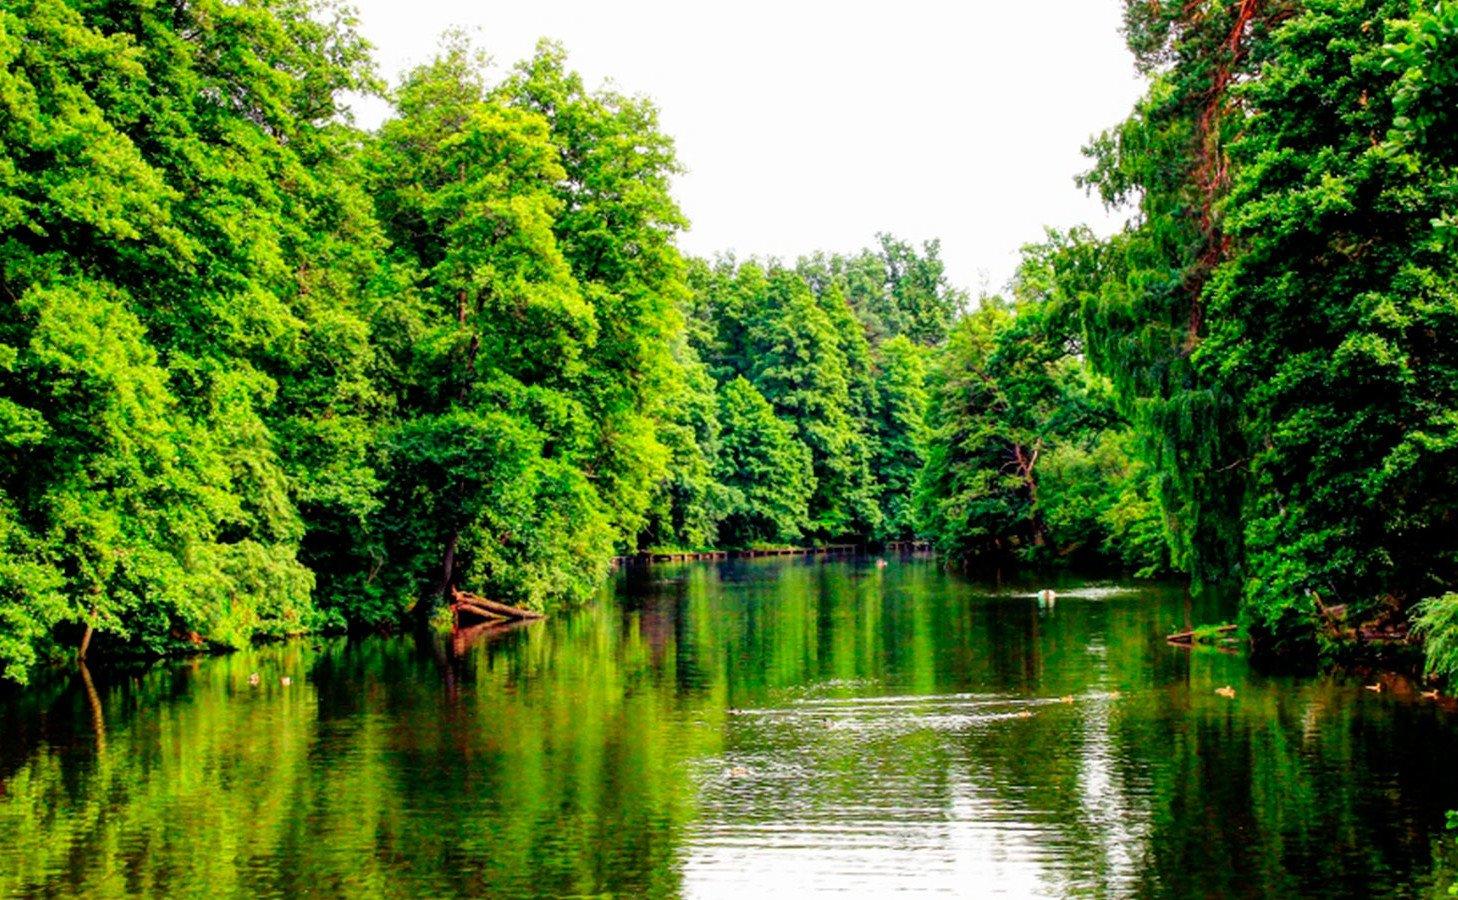 ТОП-5 фактов про Пущу-Водицу: дача, здравница, лесное хозяйство